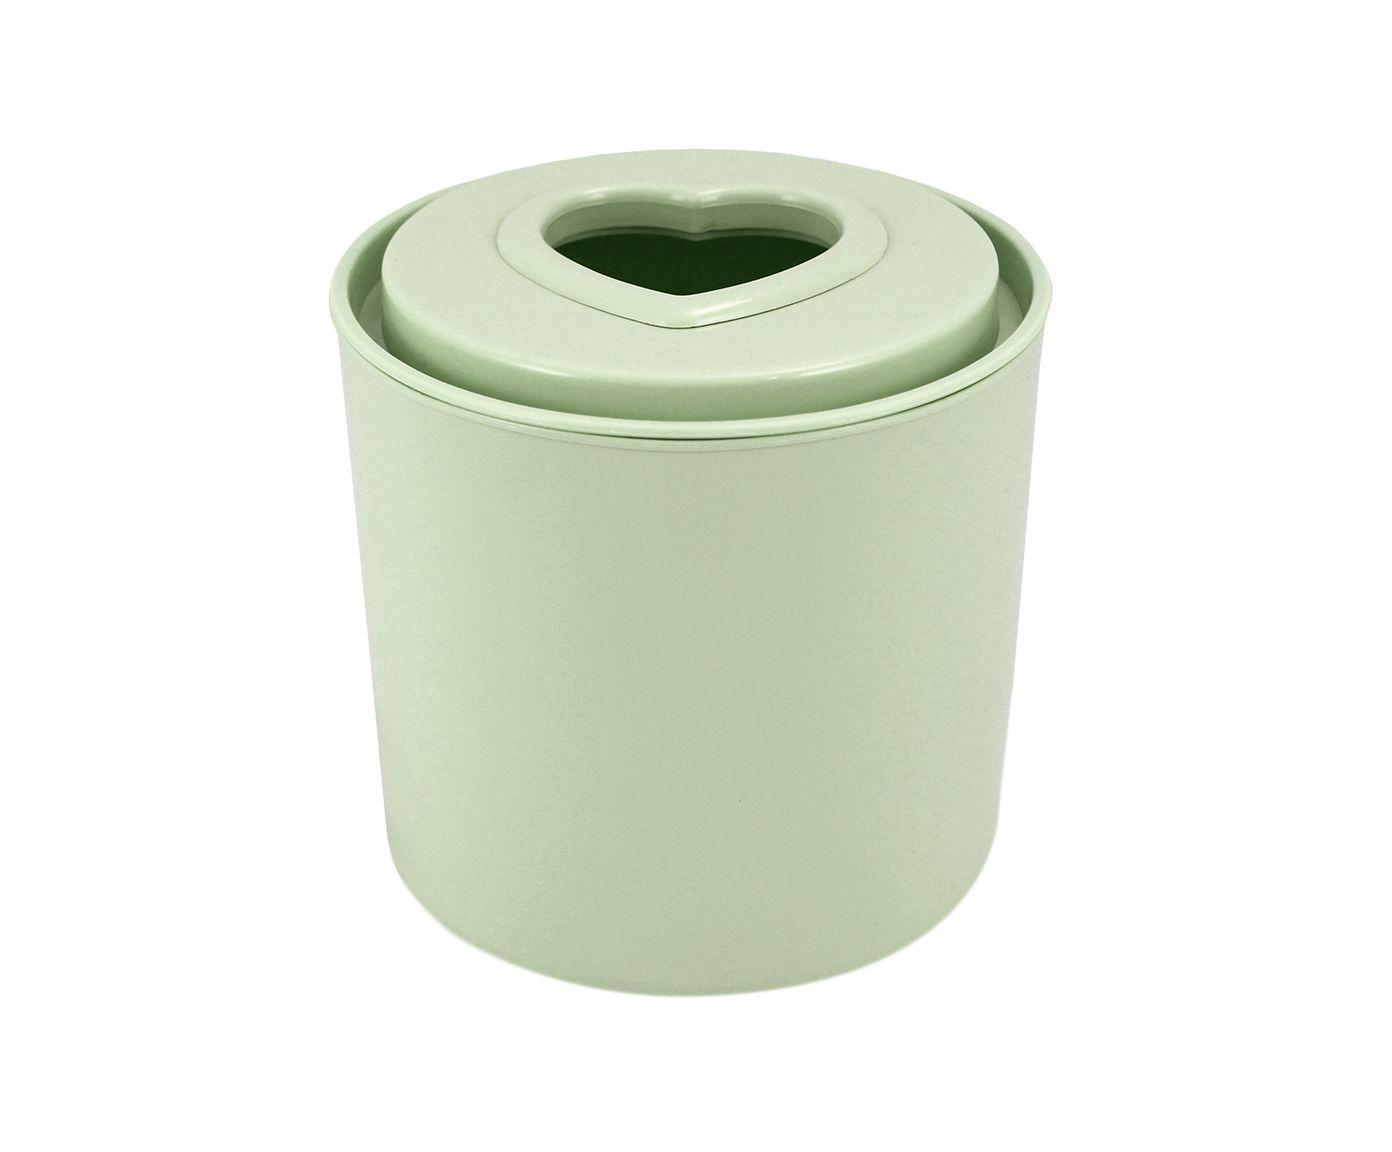 Porta-Papel Higiênico Lifestyle Verde - 13,5X14,5cm   Westwing.com.br